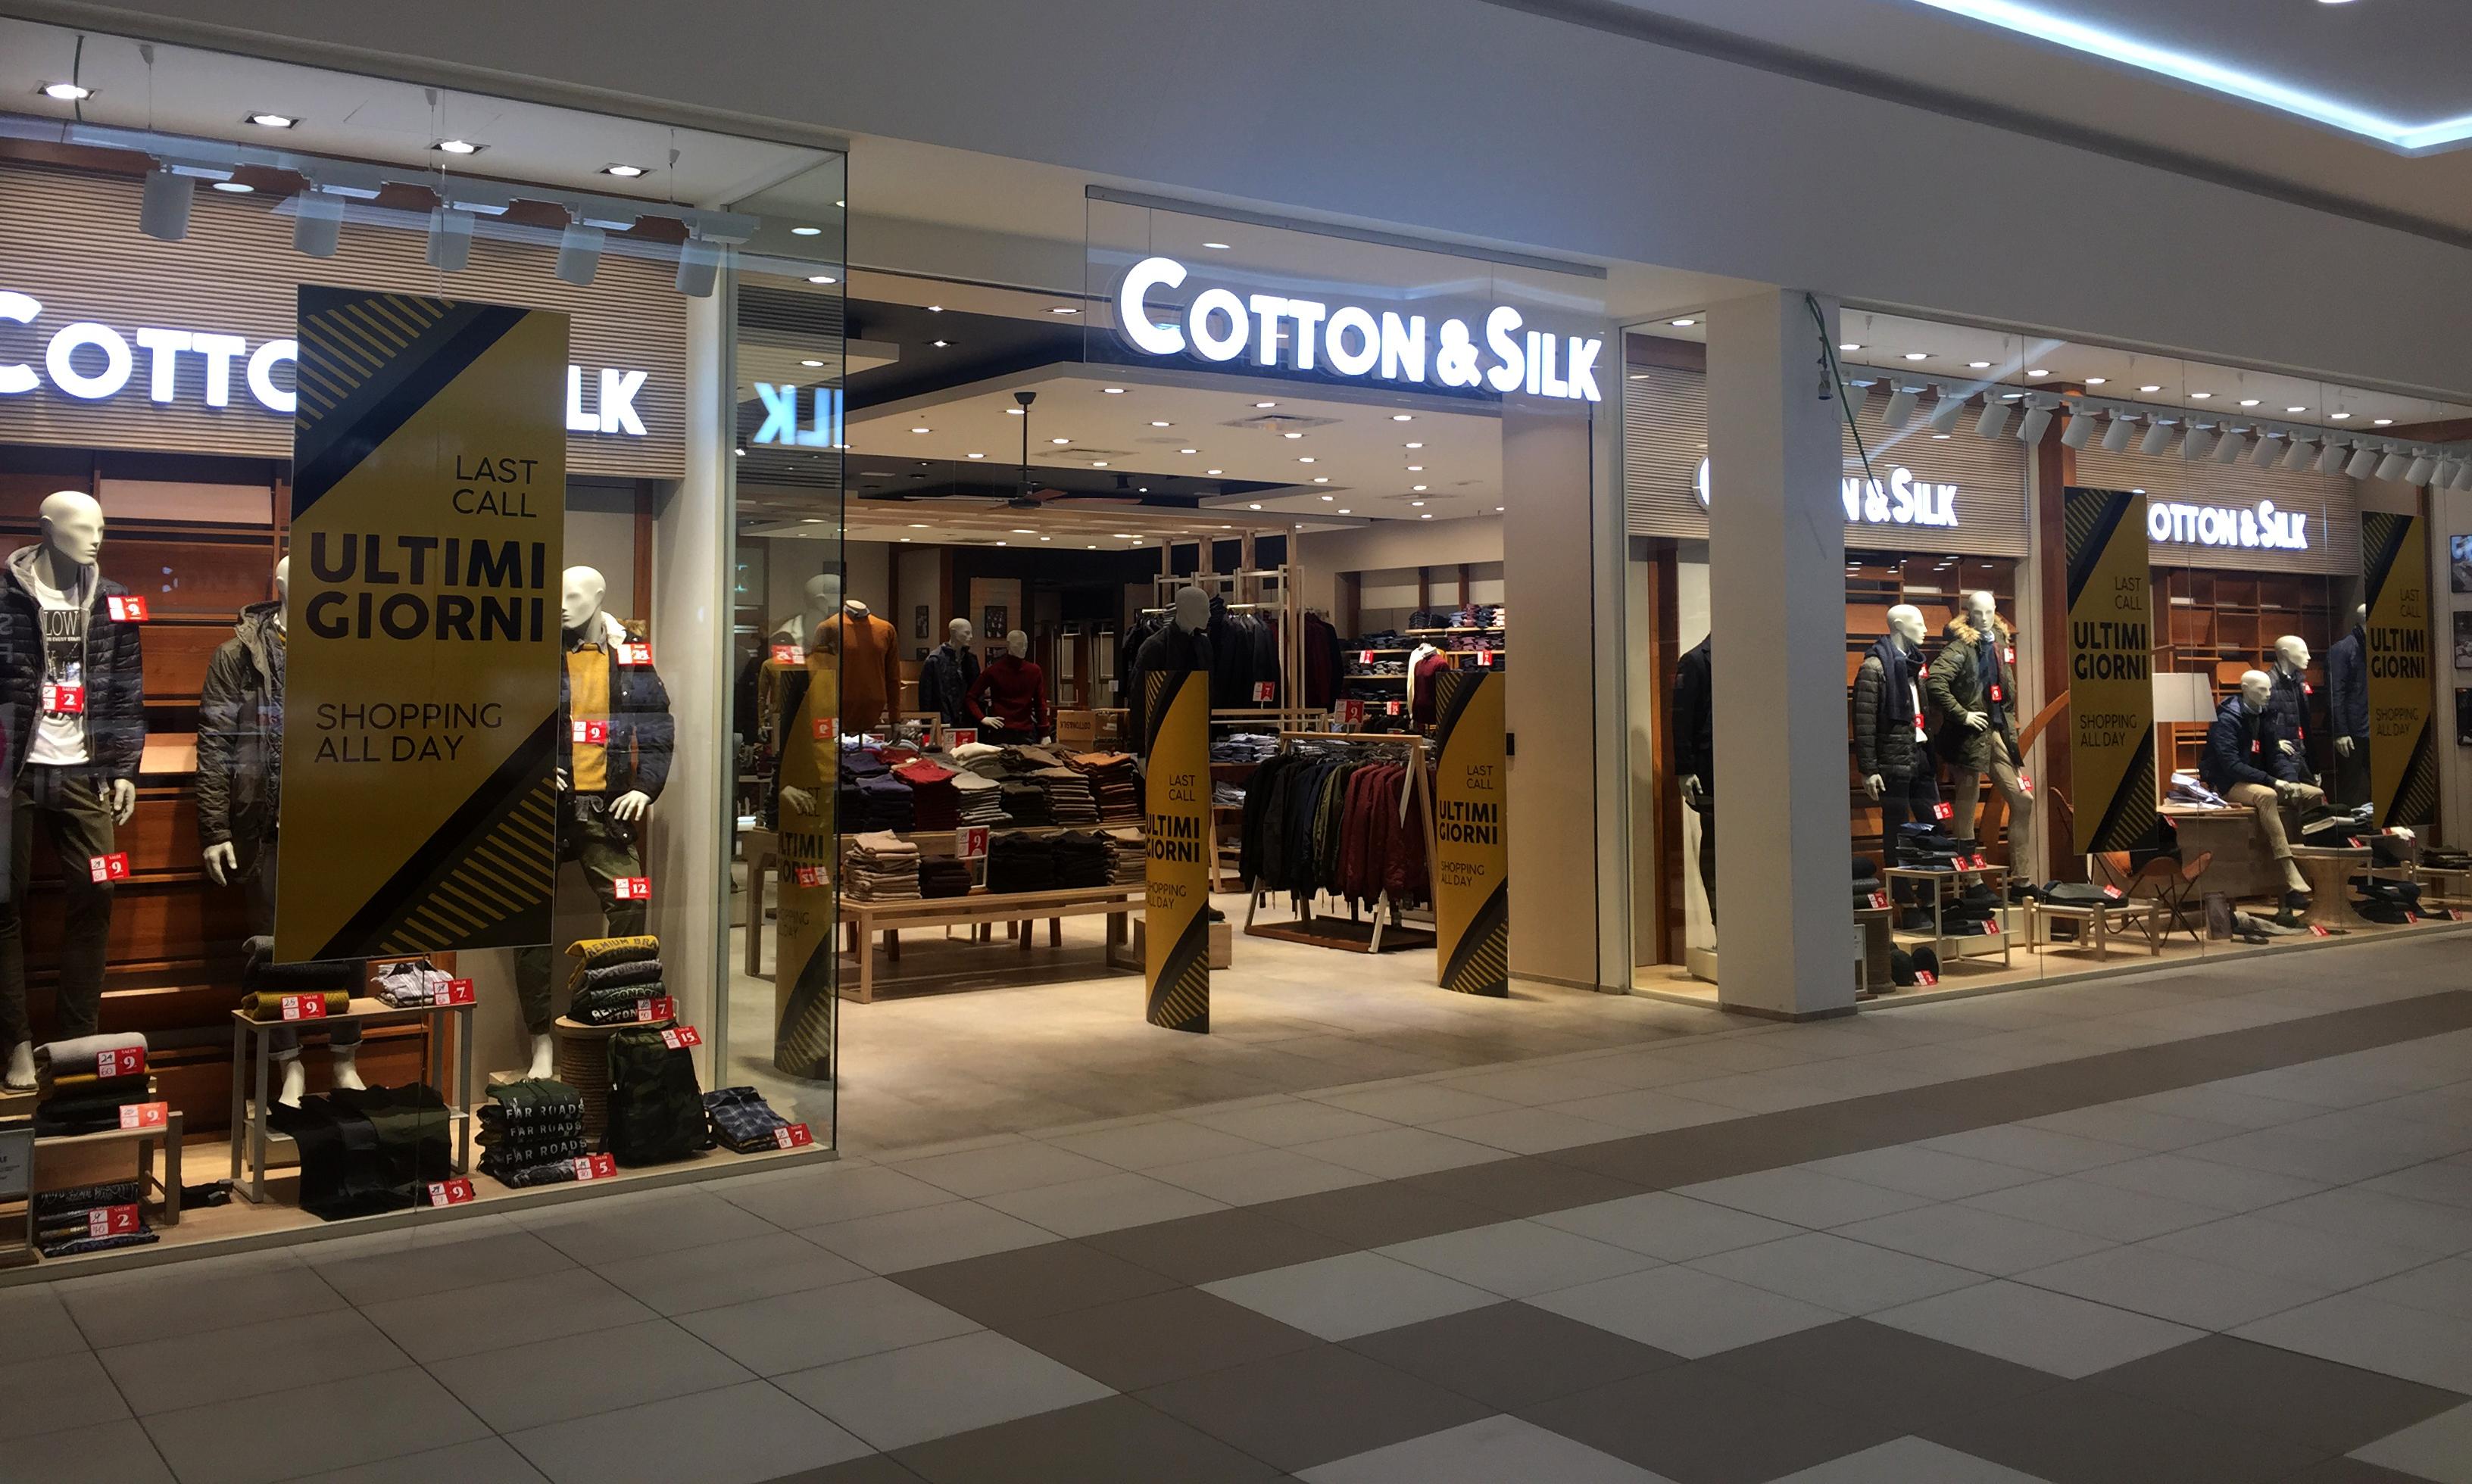 7452d5ba3b32 Cotton & Silk - Centro Commerciale Heraclea